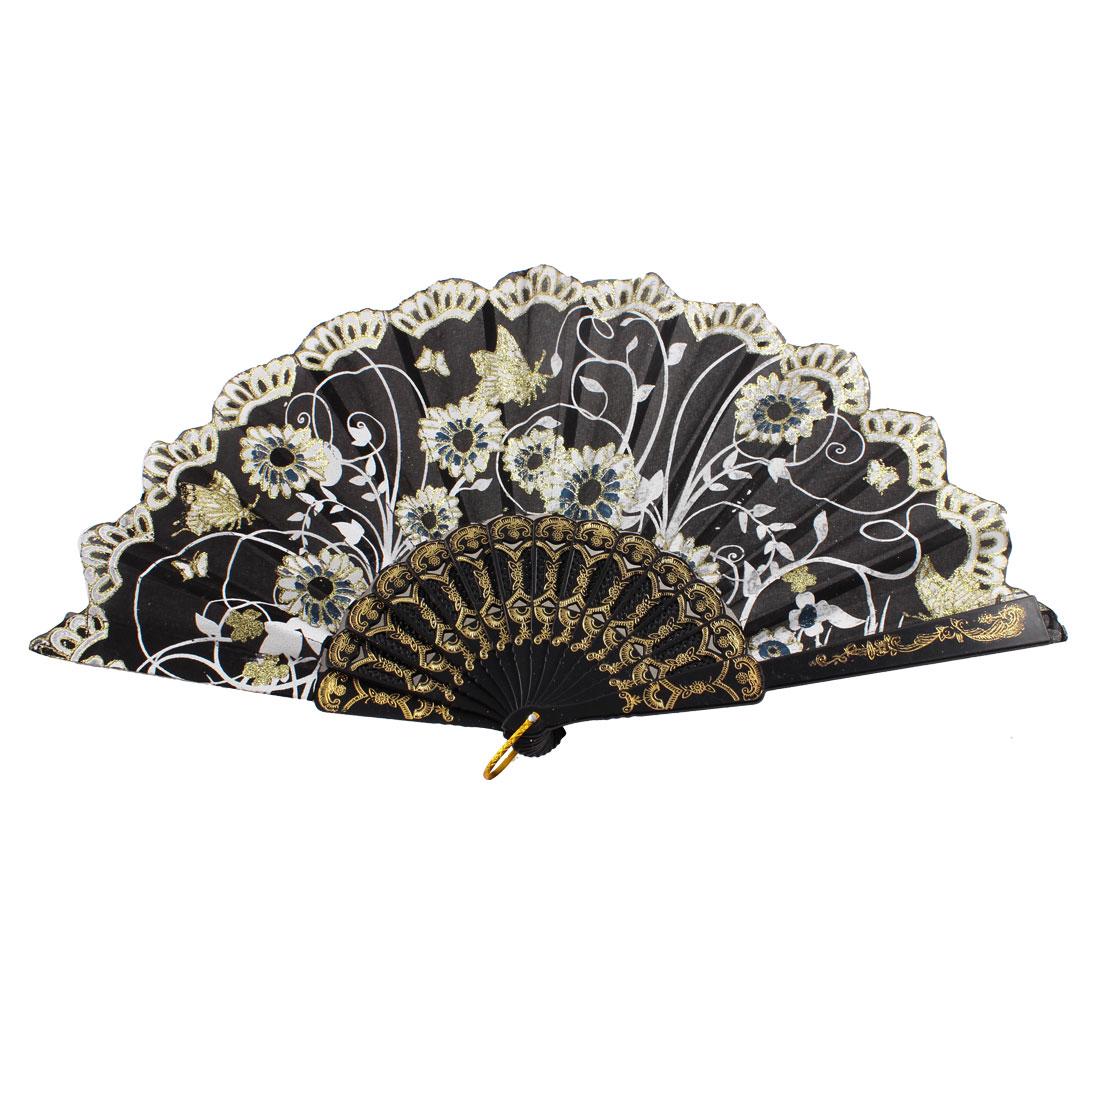 Ladies Women Glittery Powder Accent Butterflies Printed Summer Hand Fan Black